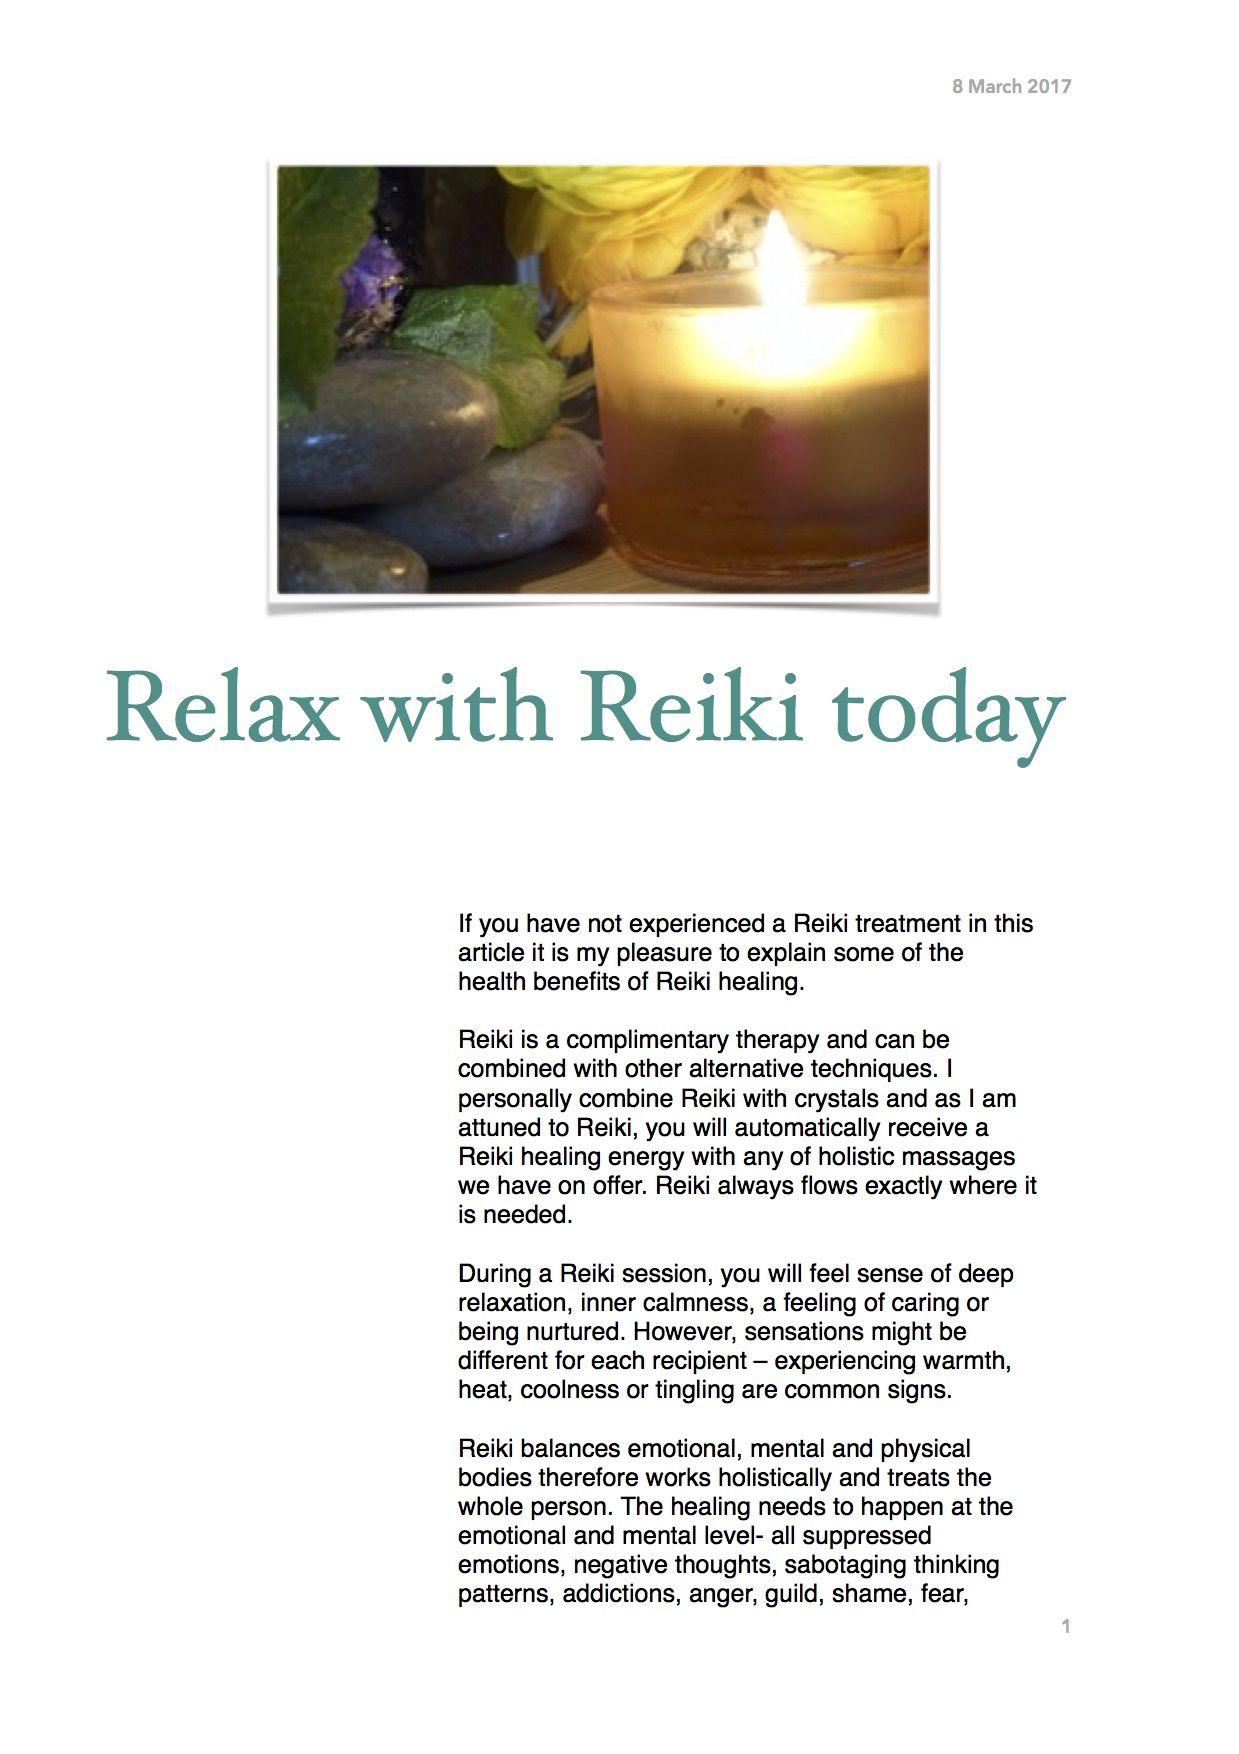 Pin by Abundantia Holistic Therapies on Reiki healing